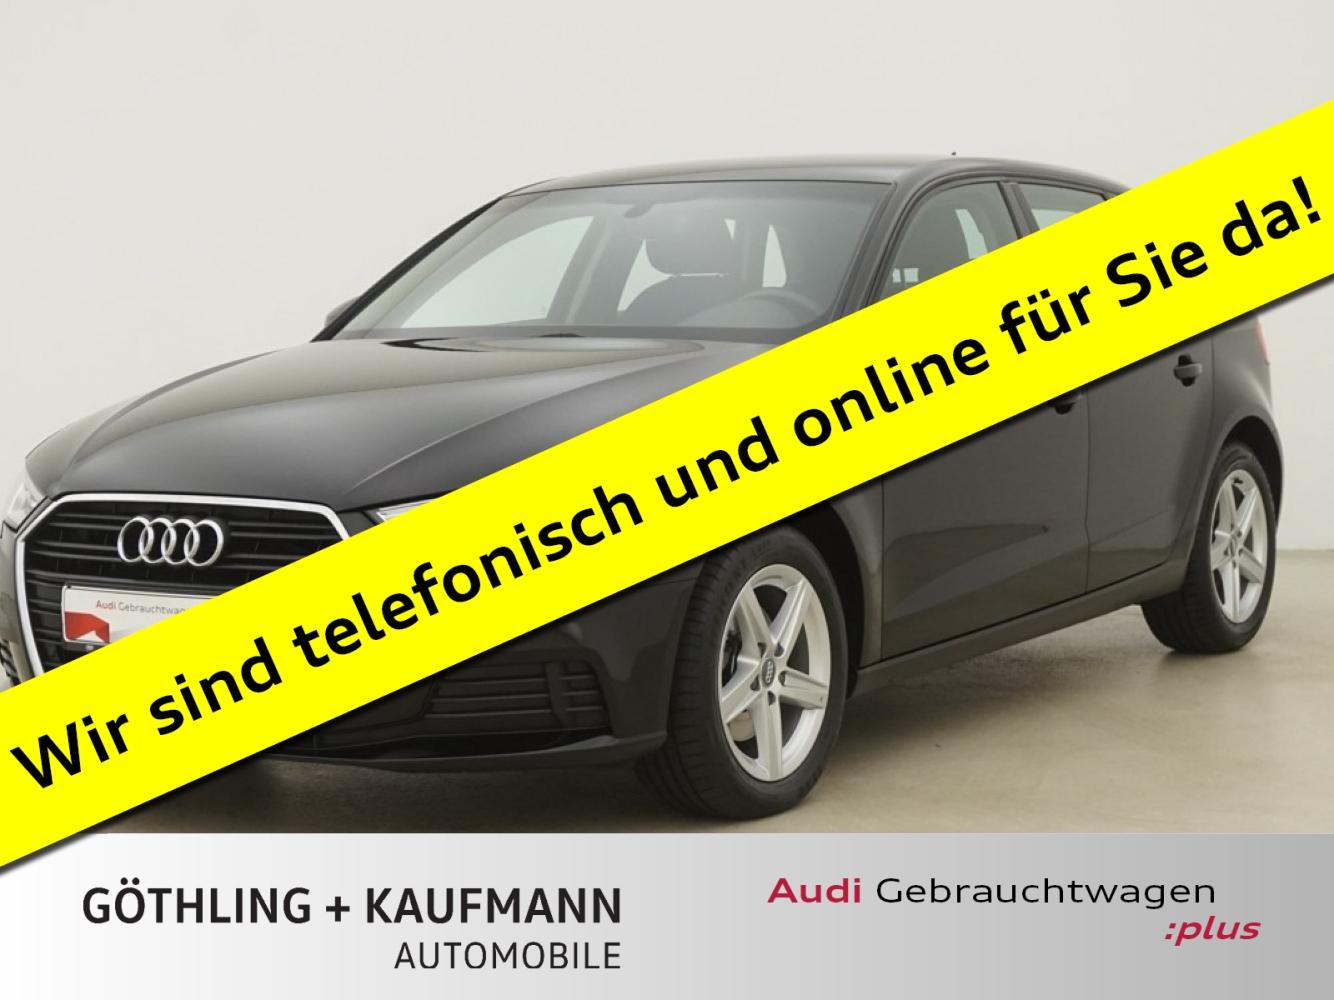 Audi A3 Sportback 2.0 TDI S tro. 110kW*ACC*Xenon+*Vir, Jahr 2017, Diesel